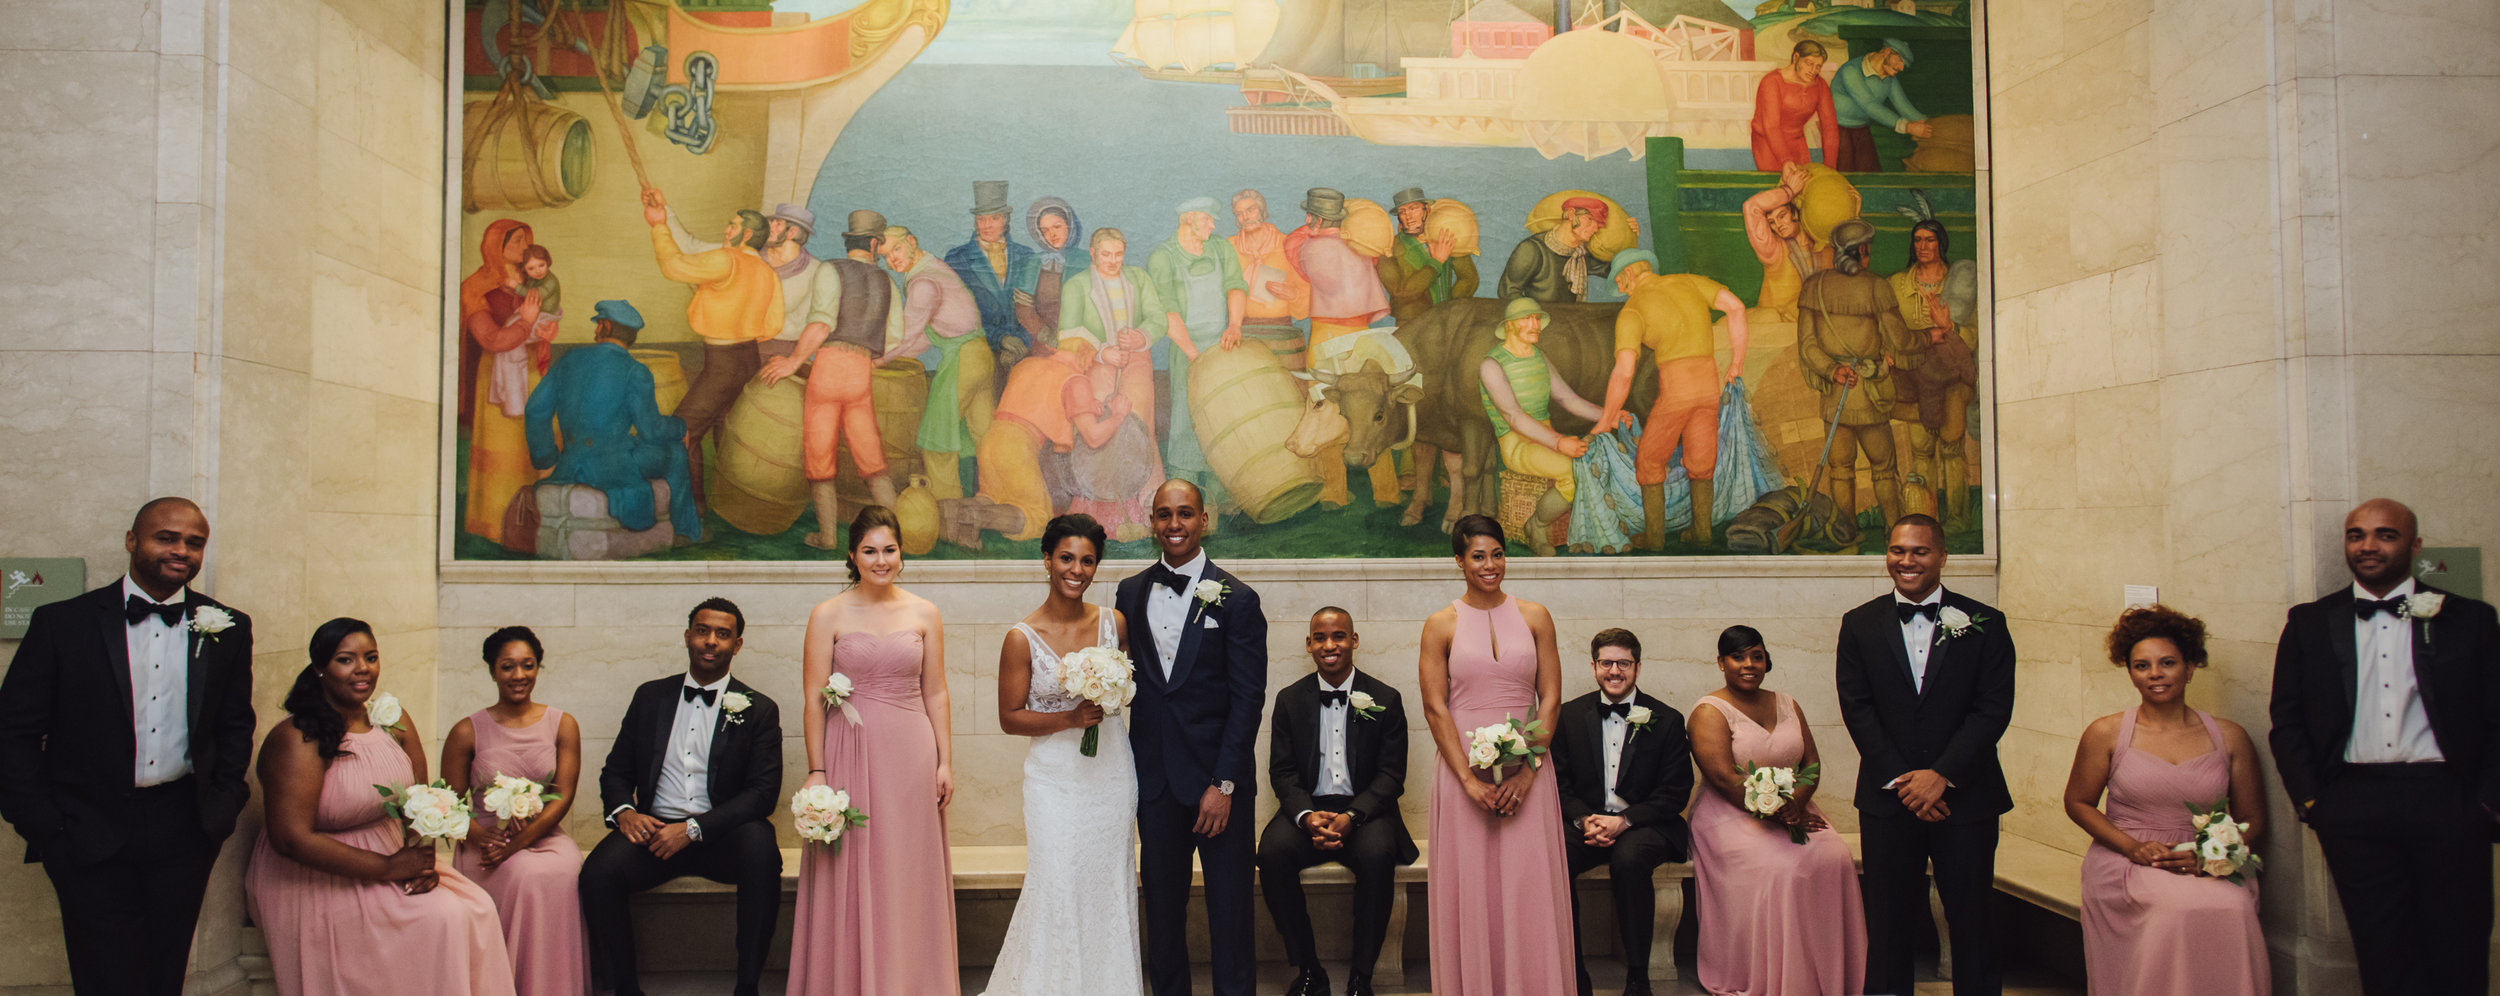 DANIELLE & BRANDON WEDDING - HEDGE ART GALLERY - NYC INTIMATE WEDDING PHOTOGRAPHER - CHI-CHI ARI-153.jpg